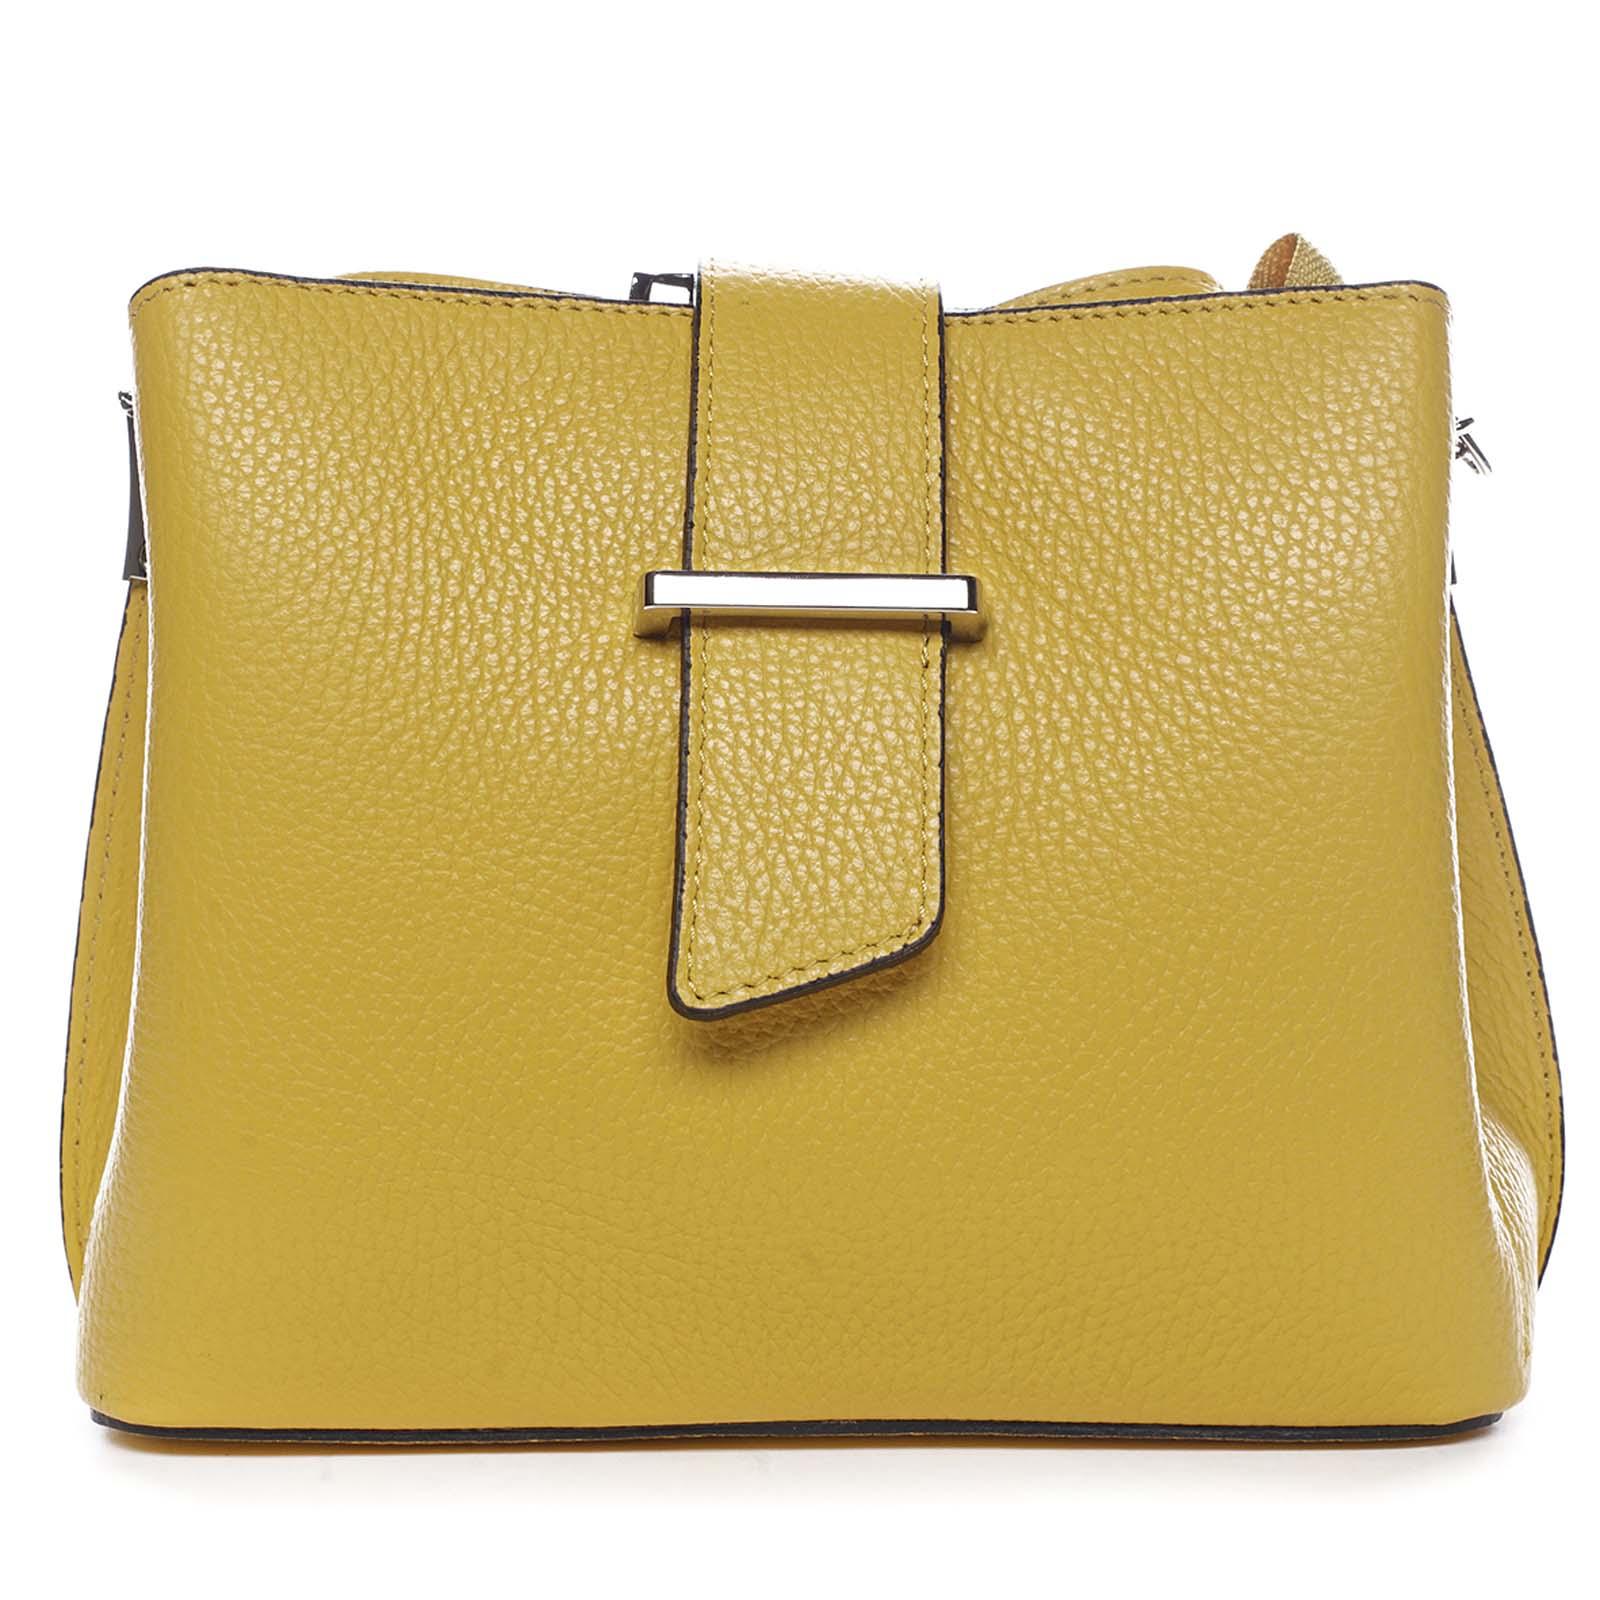 Dámská kožená crossbody kabelka žlutá - ItalY Euren